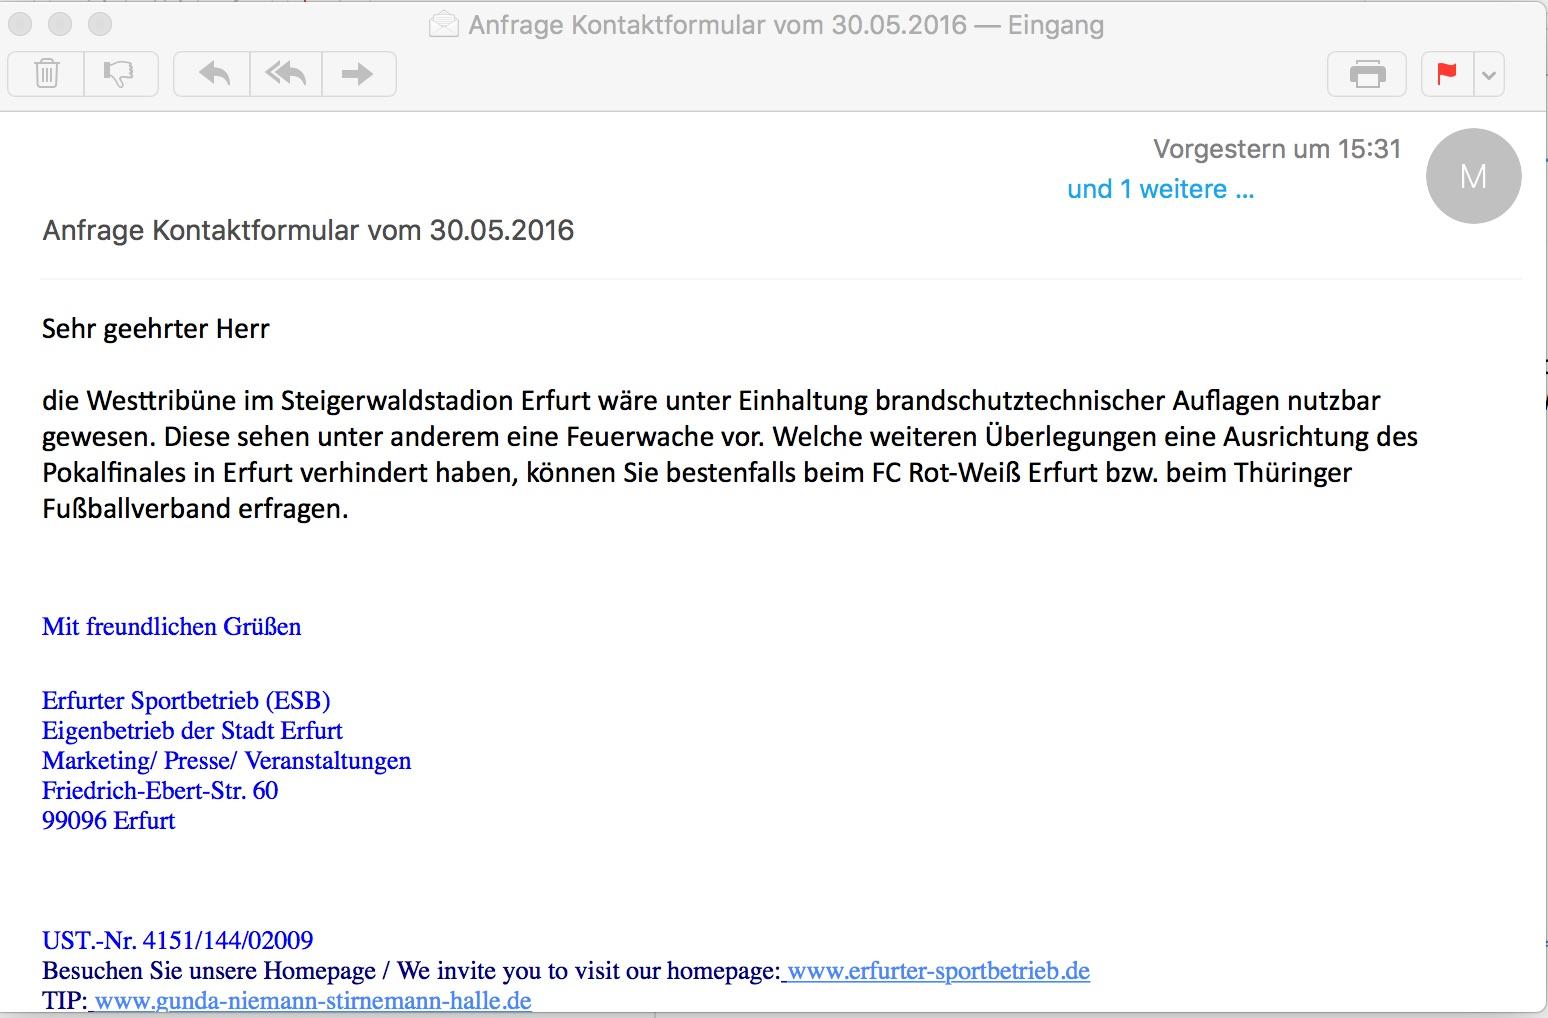 Mail Erfurter Sportbetrieb